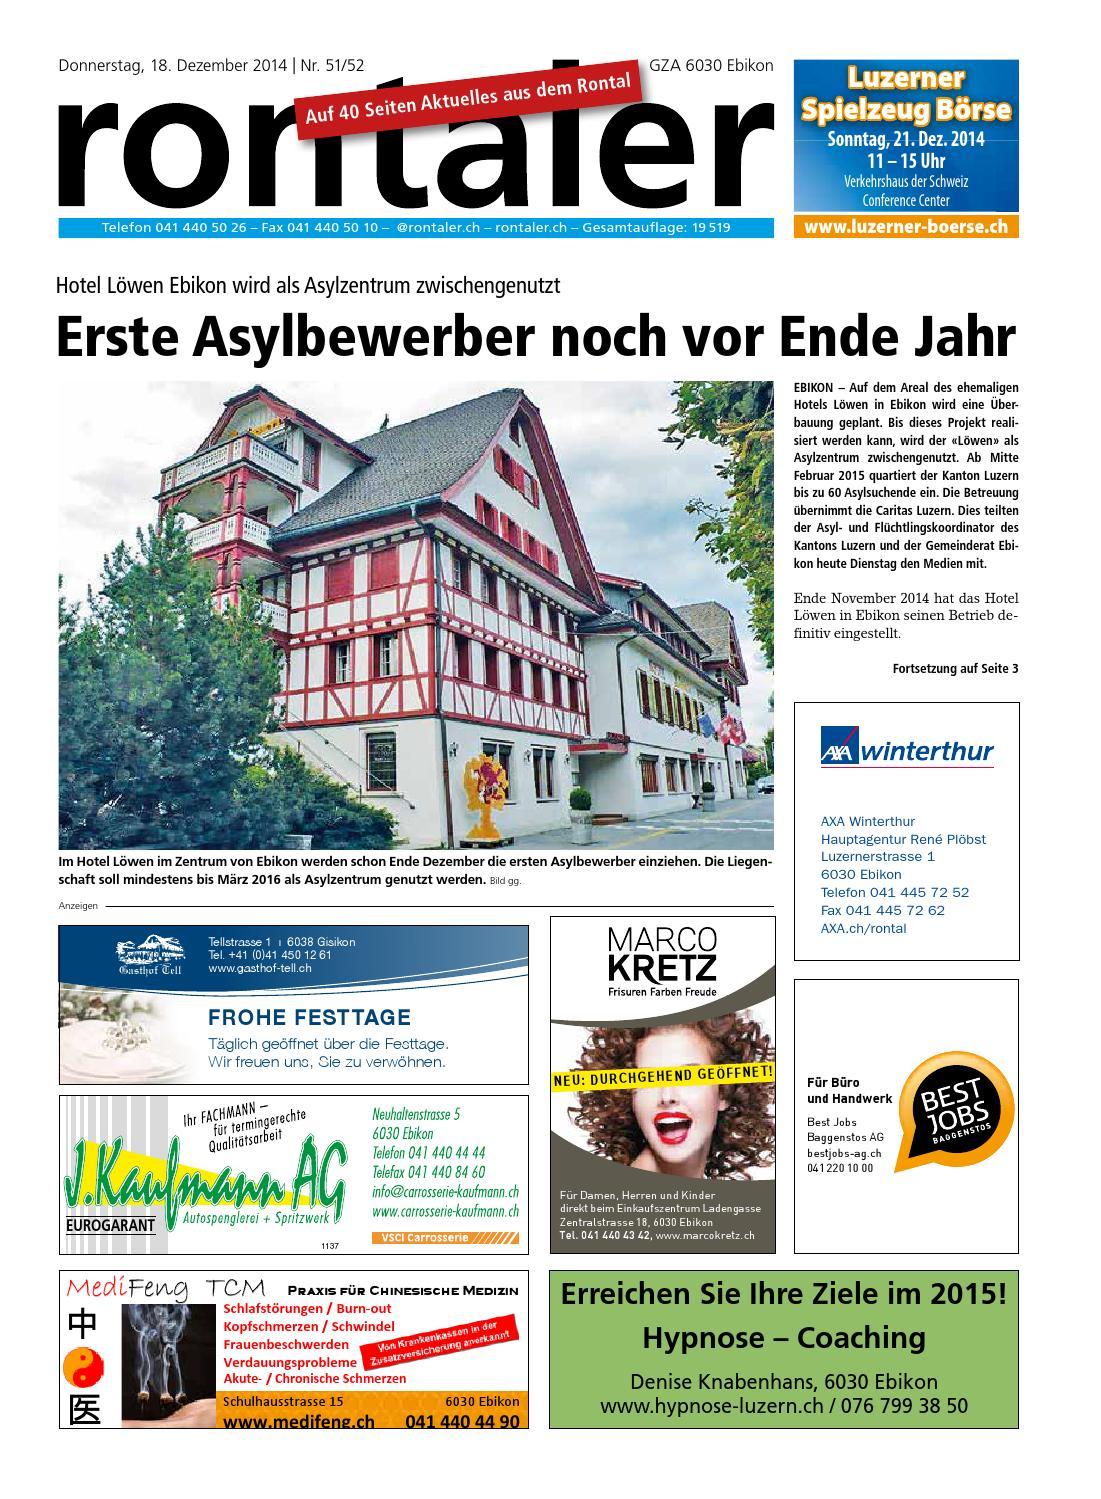 Frher VS Heute | Fs 18 mods | Pages Directory - Facebook